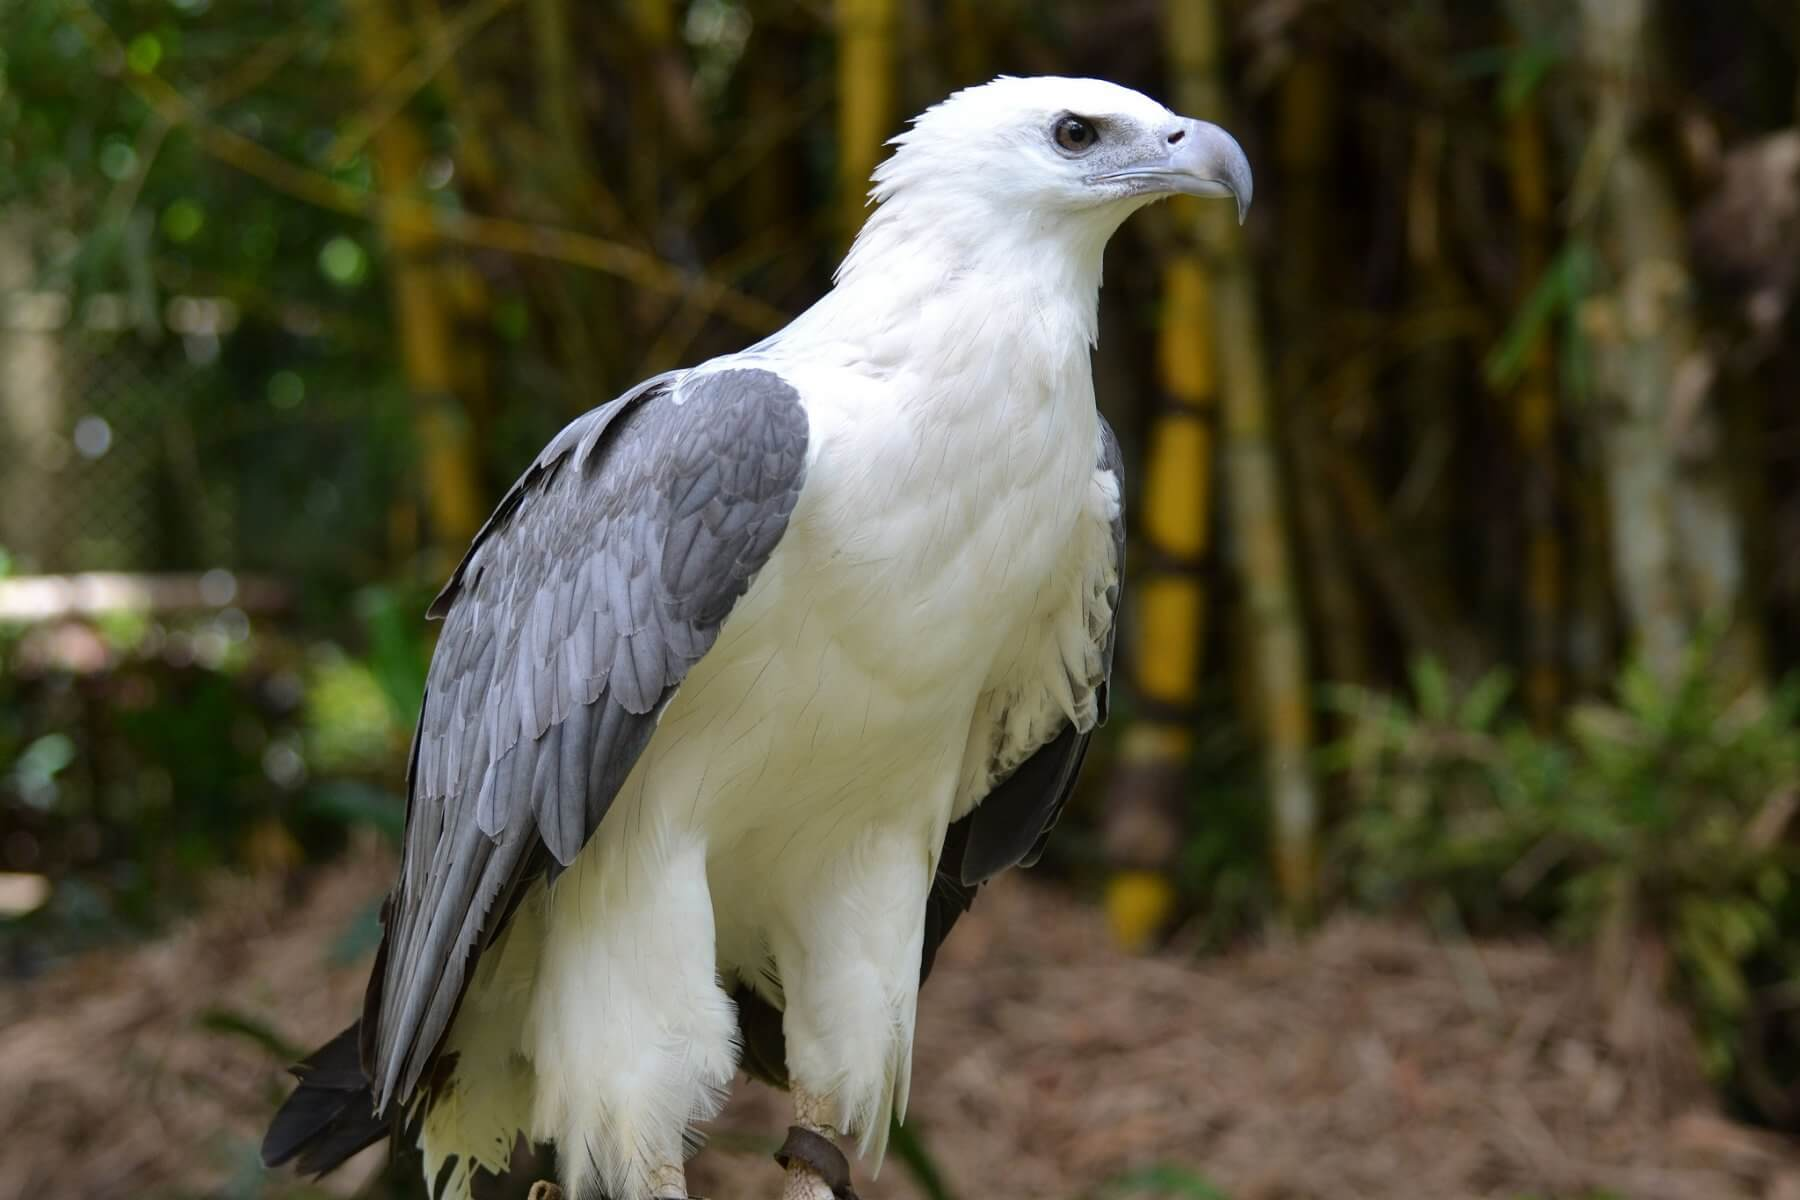 Awesome White Eagle